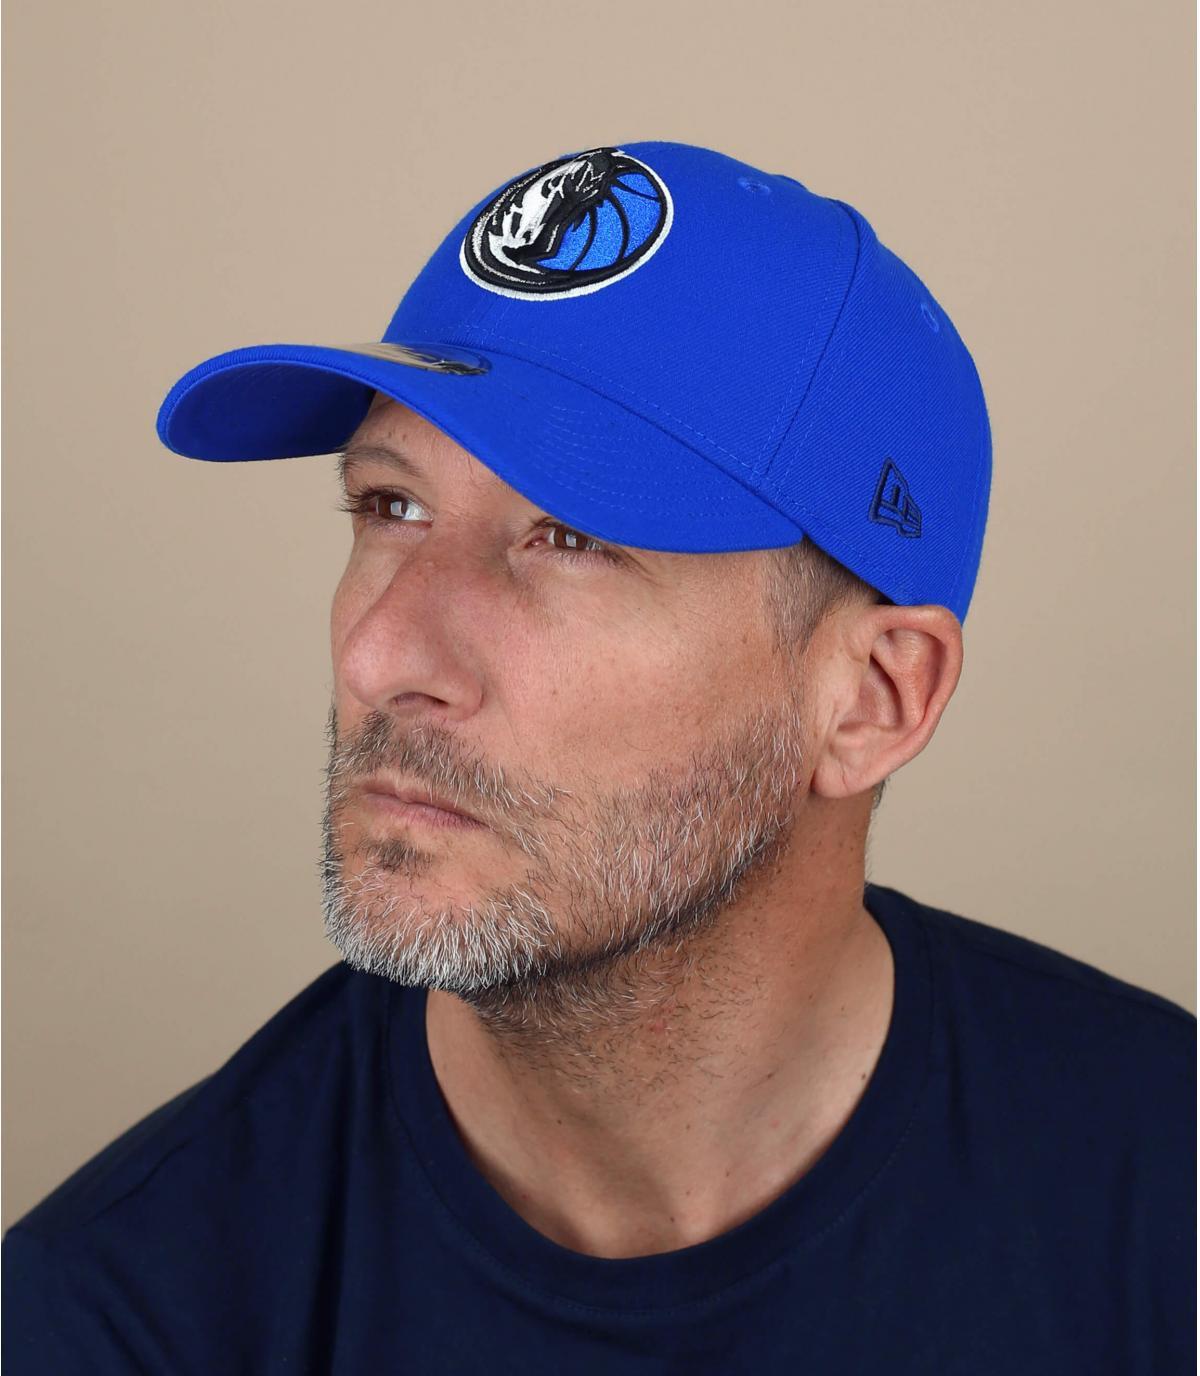 Cappellino blu NBA Mavericks